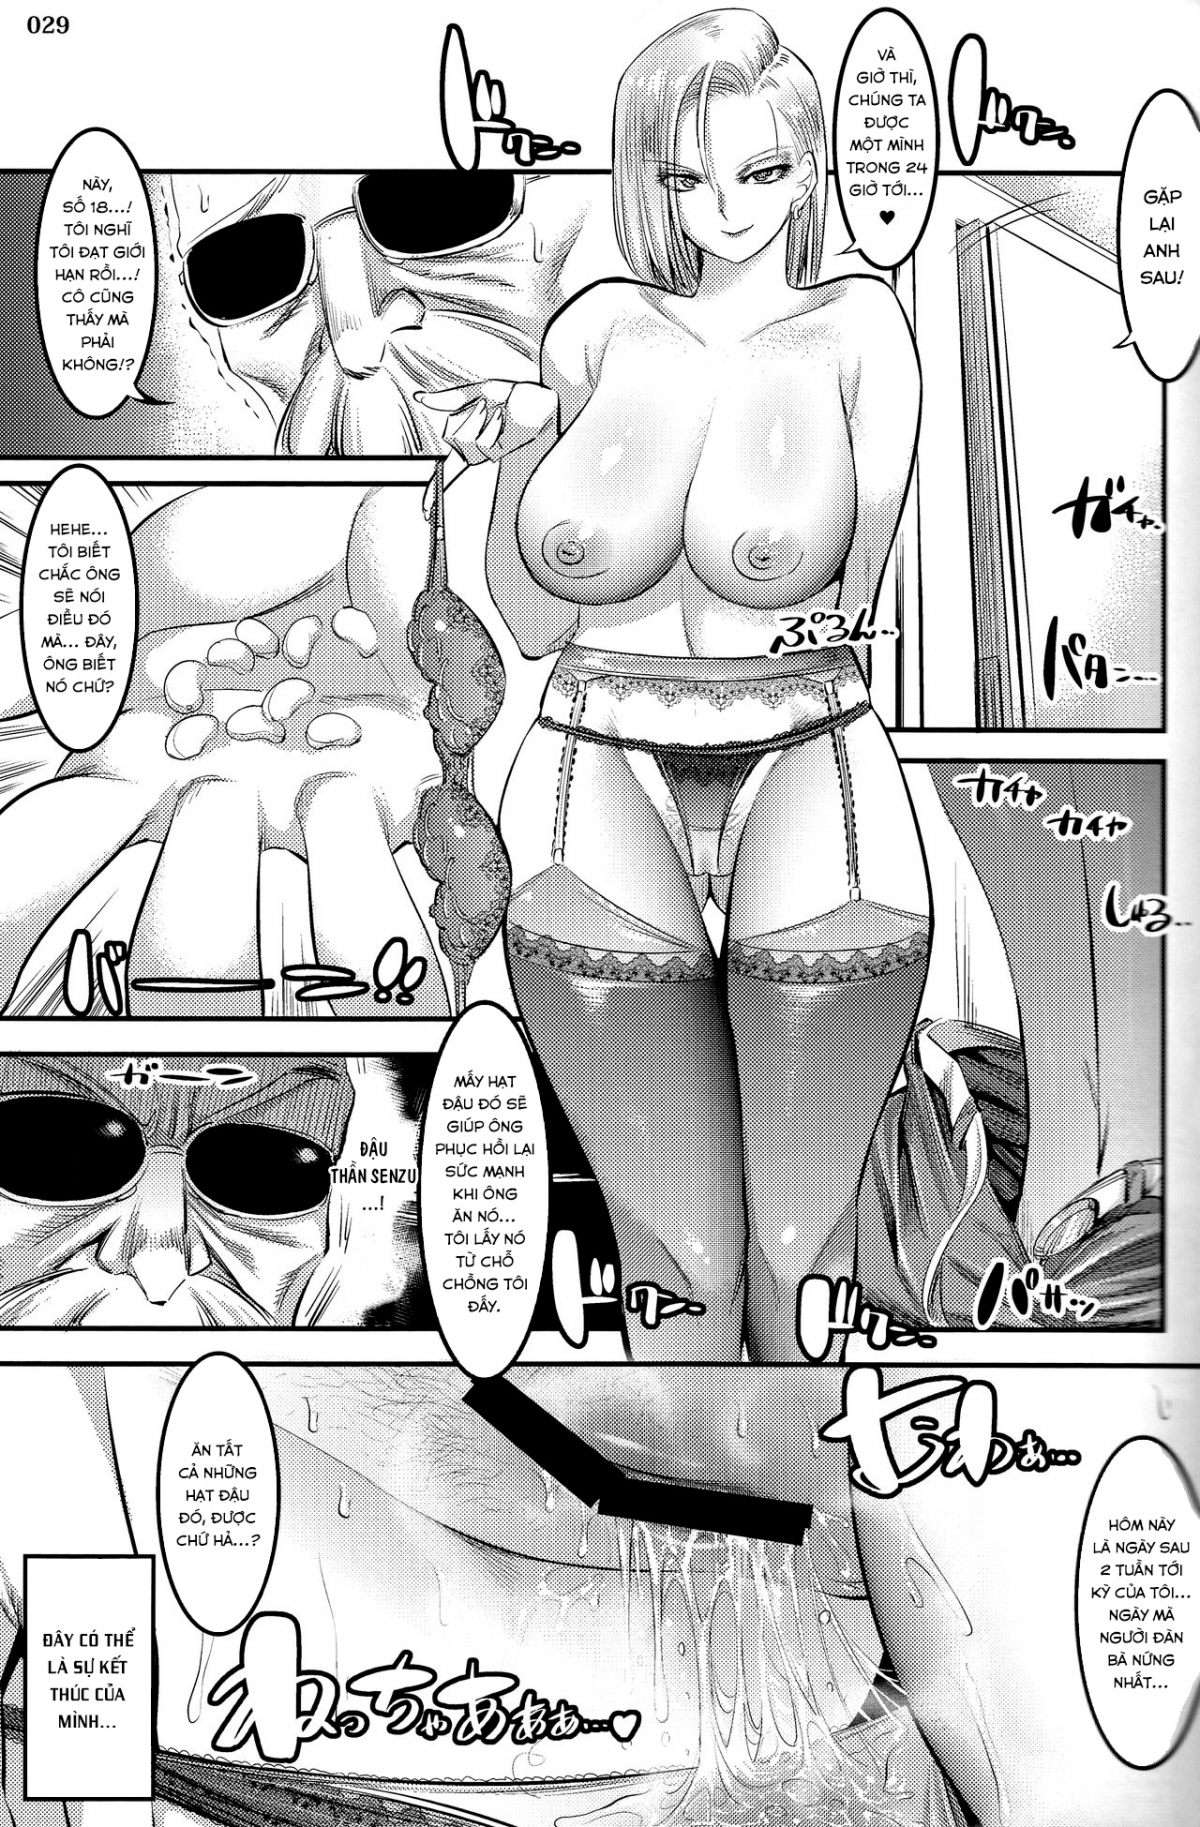 Hình ảnh  trong bài viết Truyện hentai 18-gou ni Mainichi Muriyari Semen Shiboritorareru Hon